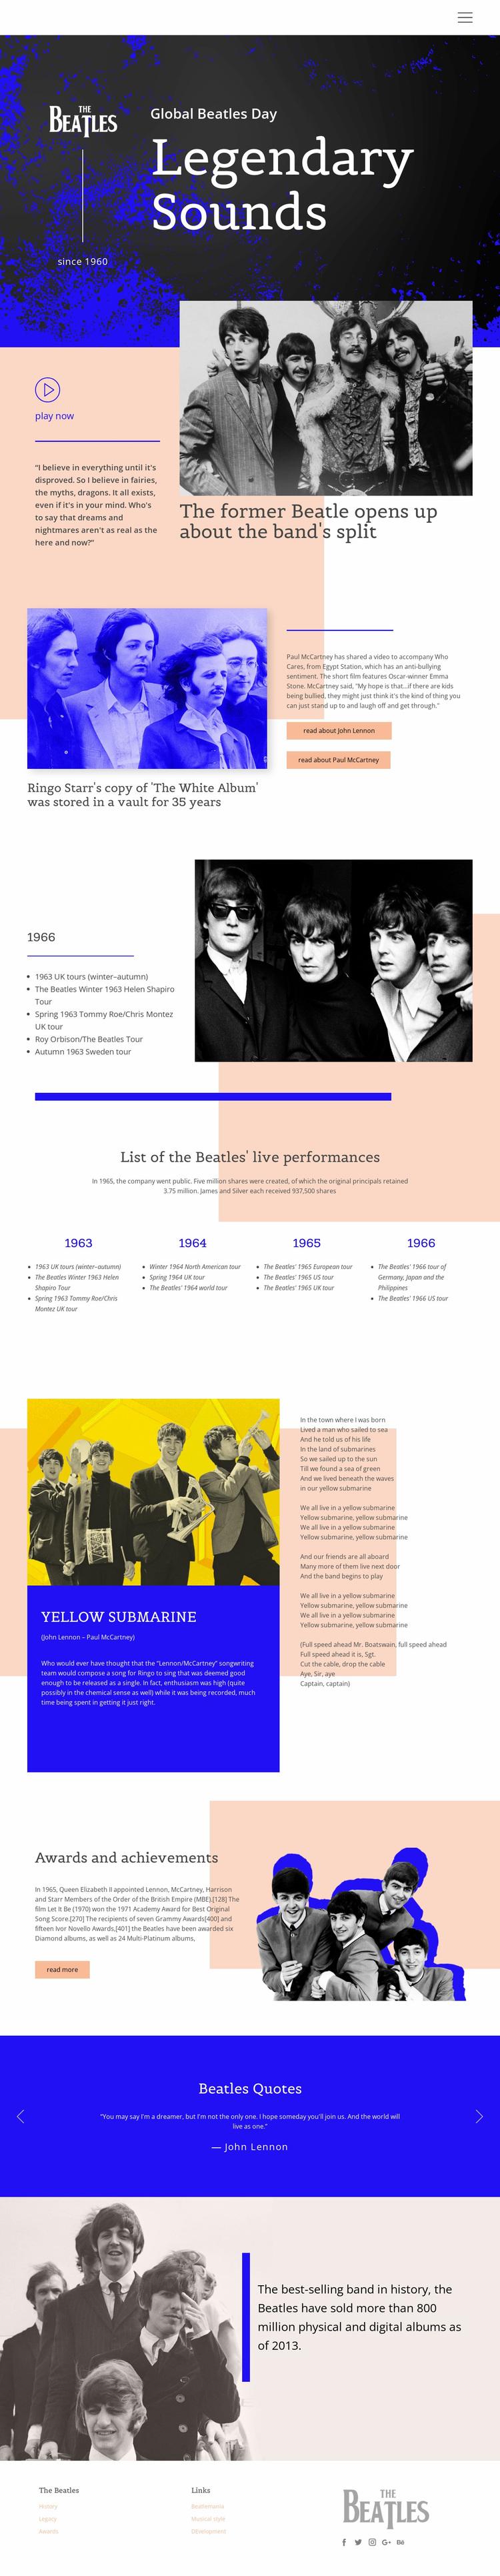 Legendary Sounds Website Design